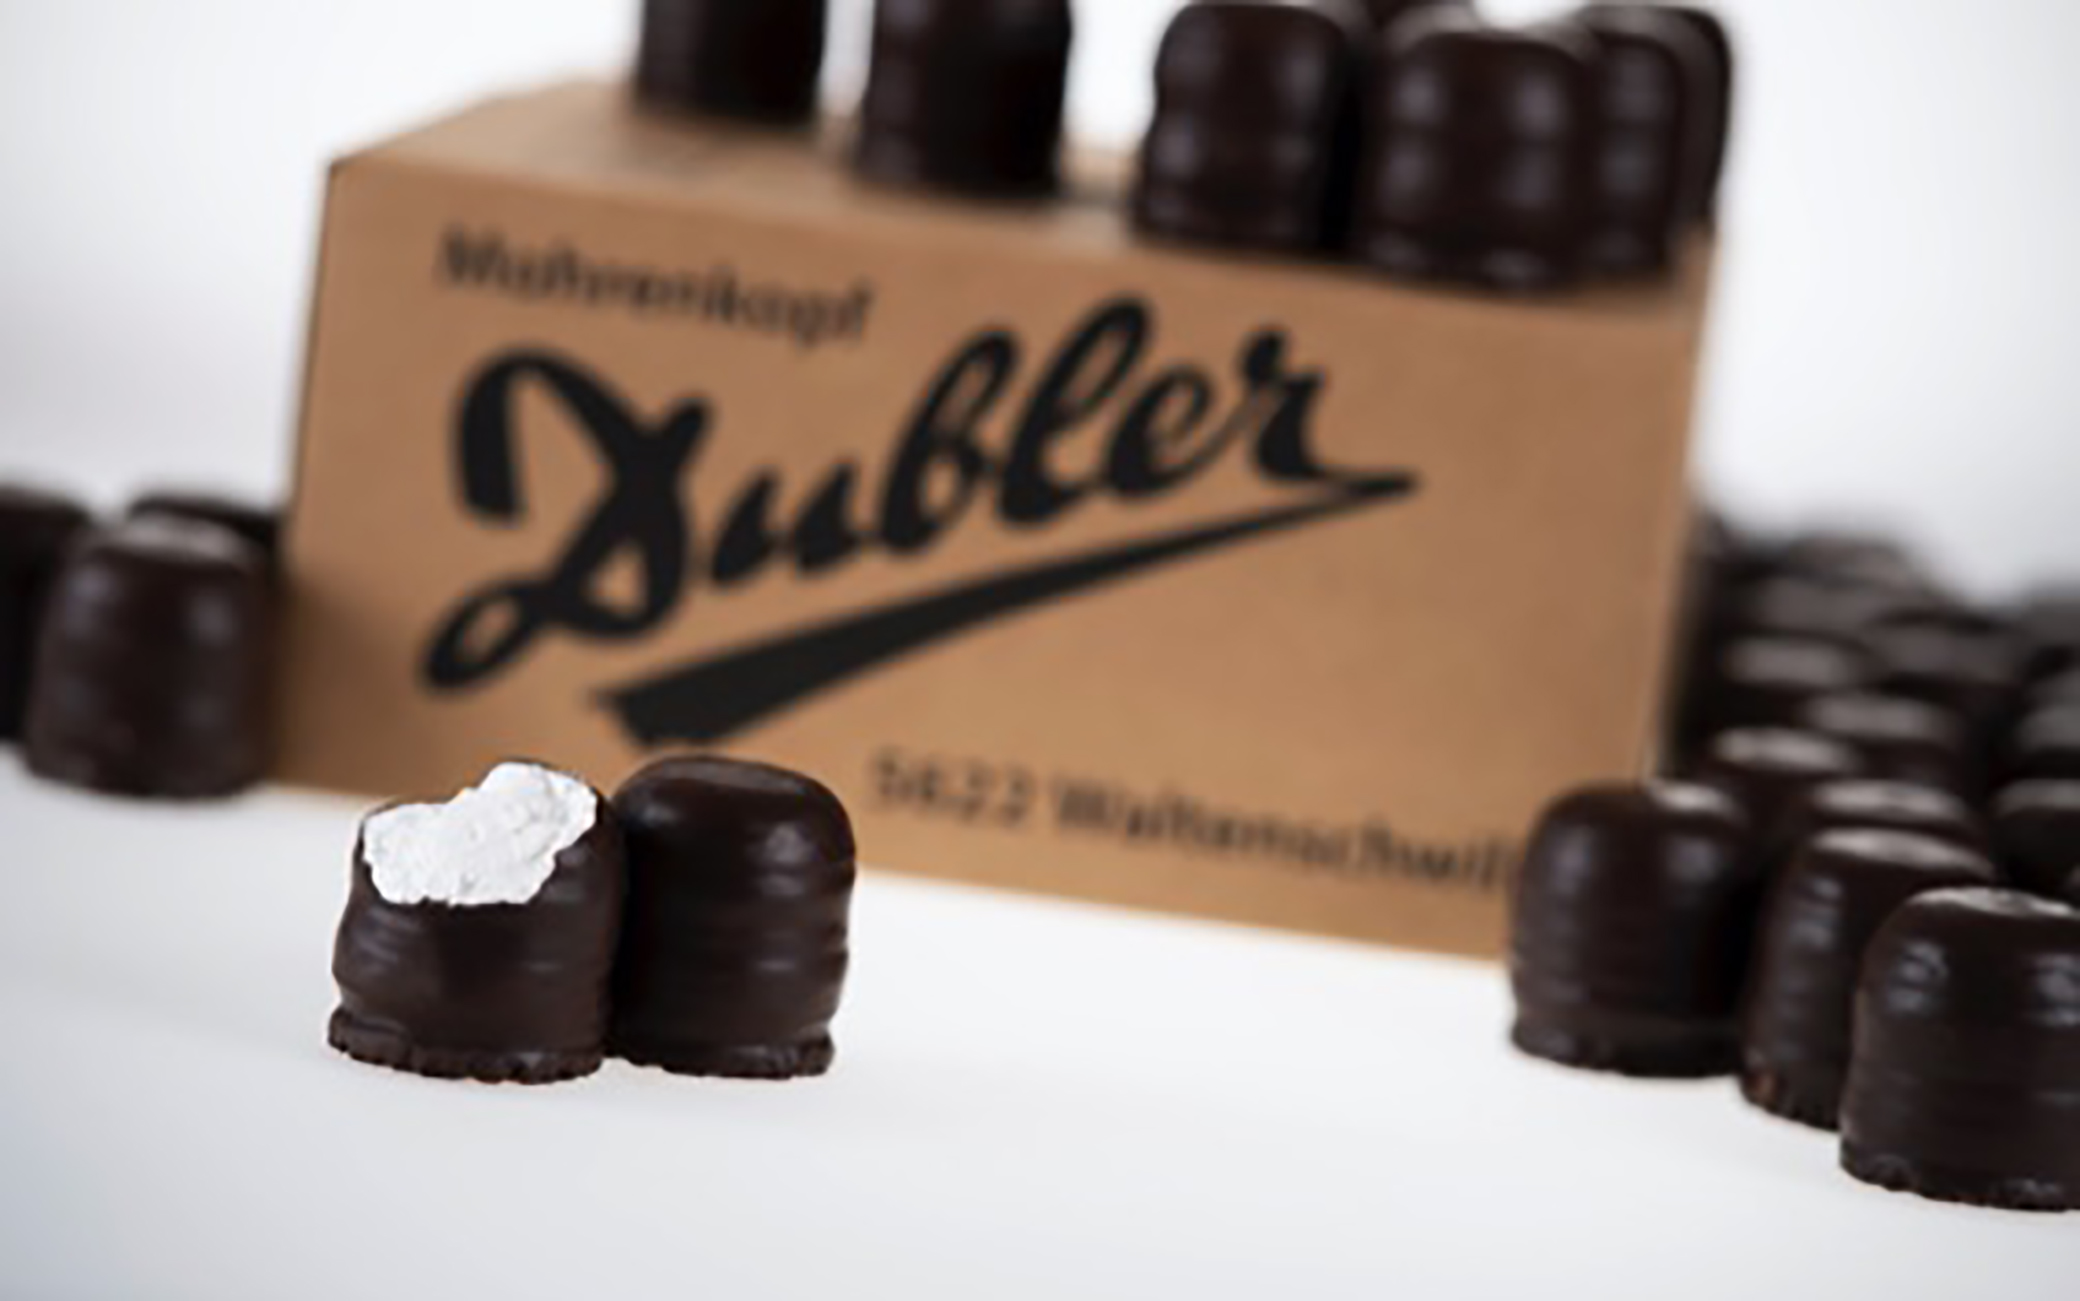 Cioccolatini Dubler